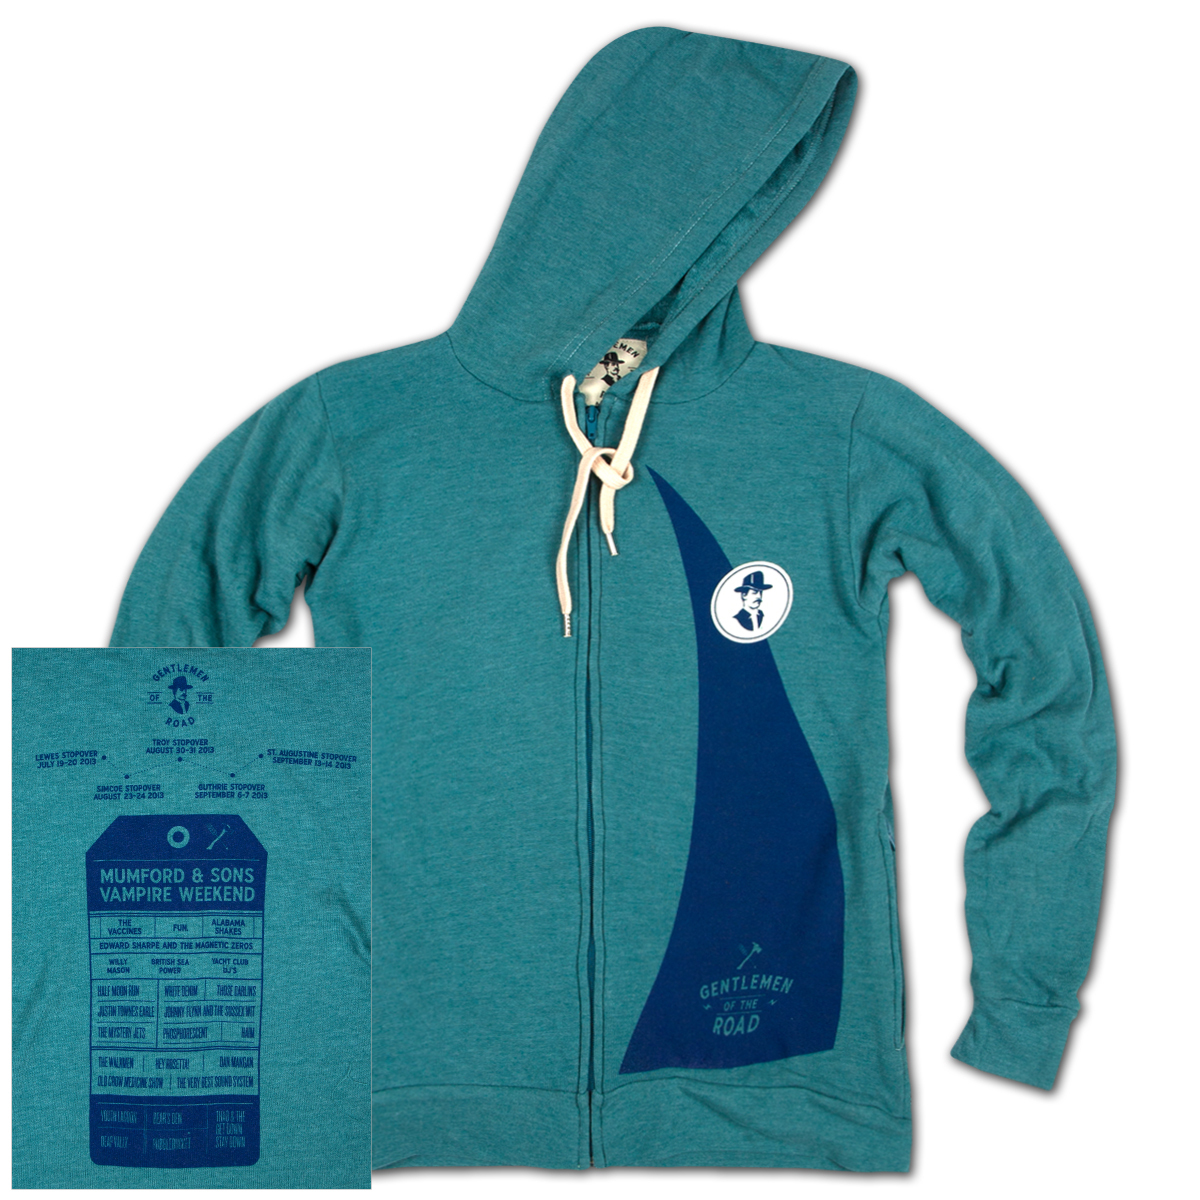 GOTR 2013 Unisex Custom Zip Hoodie w/ Zip Pockets